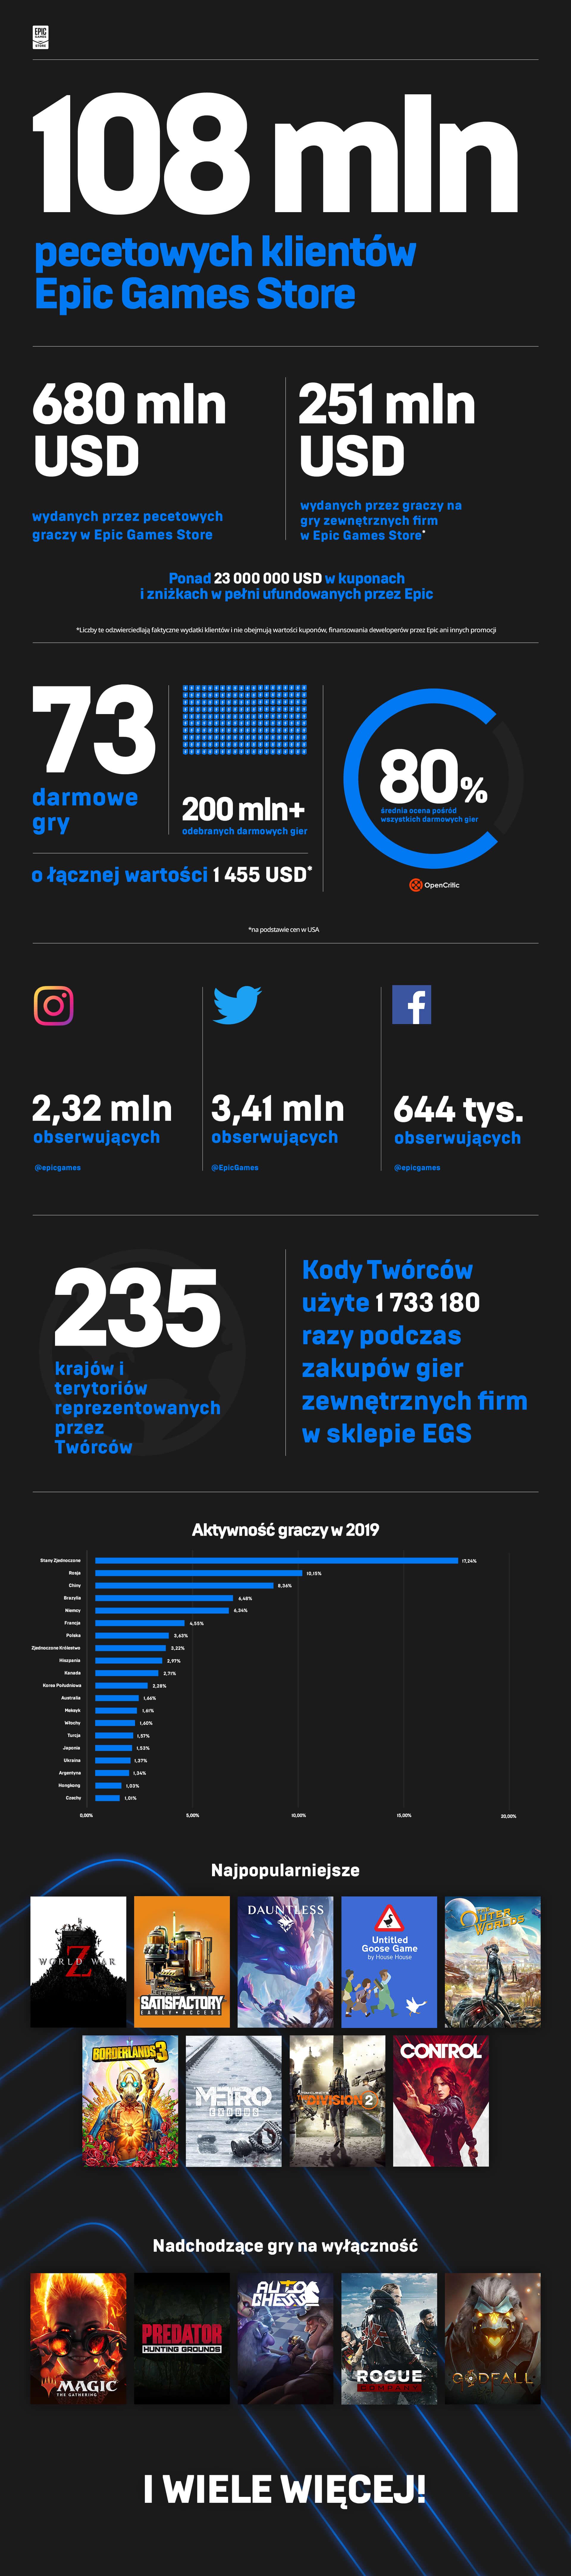 PL_EGS_Infographic.jpg